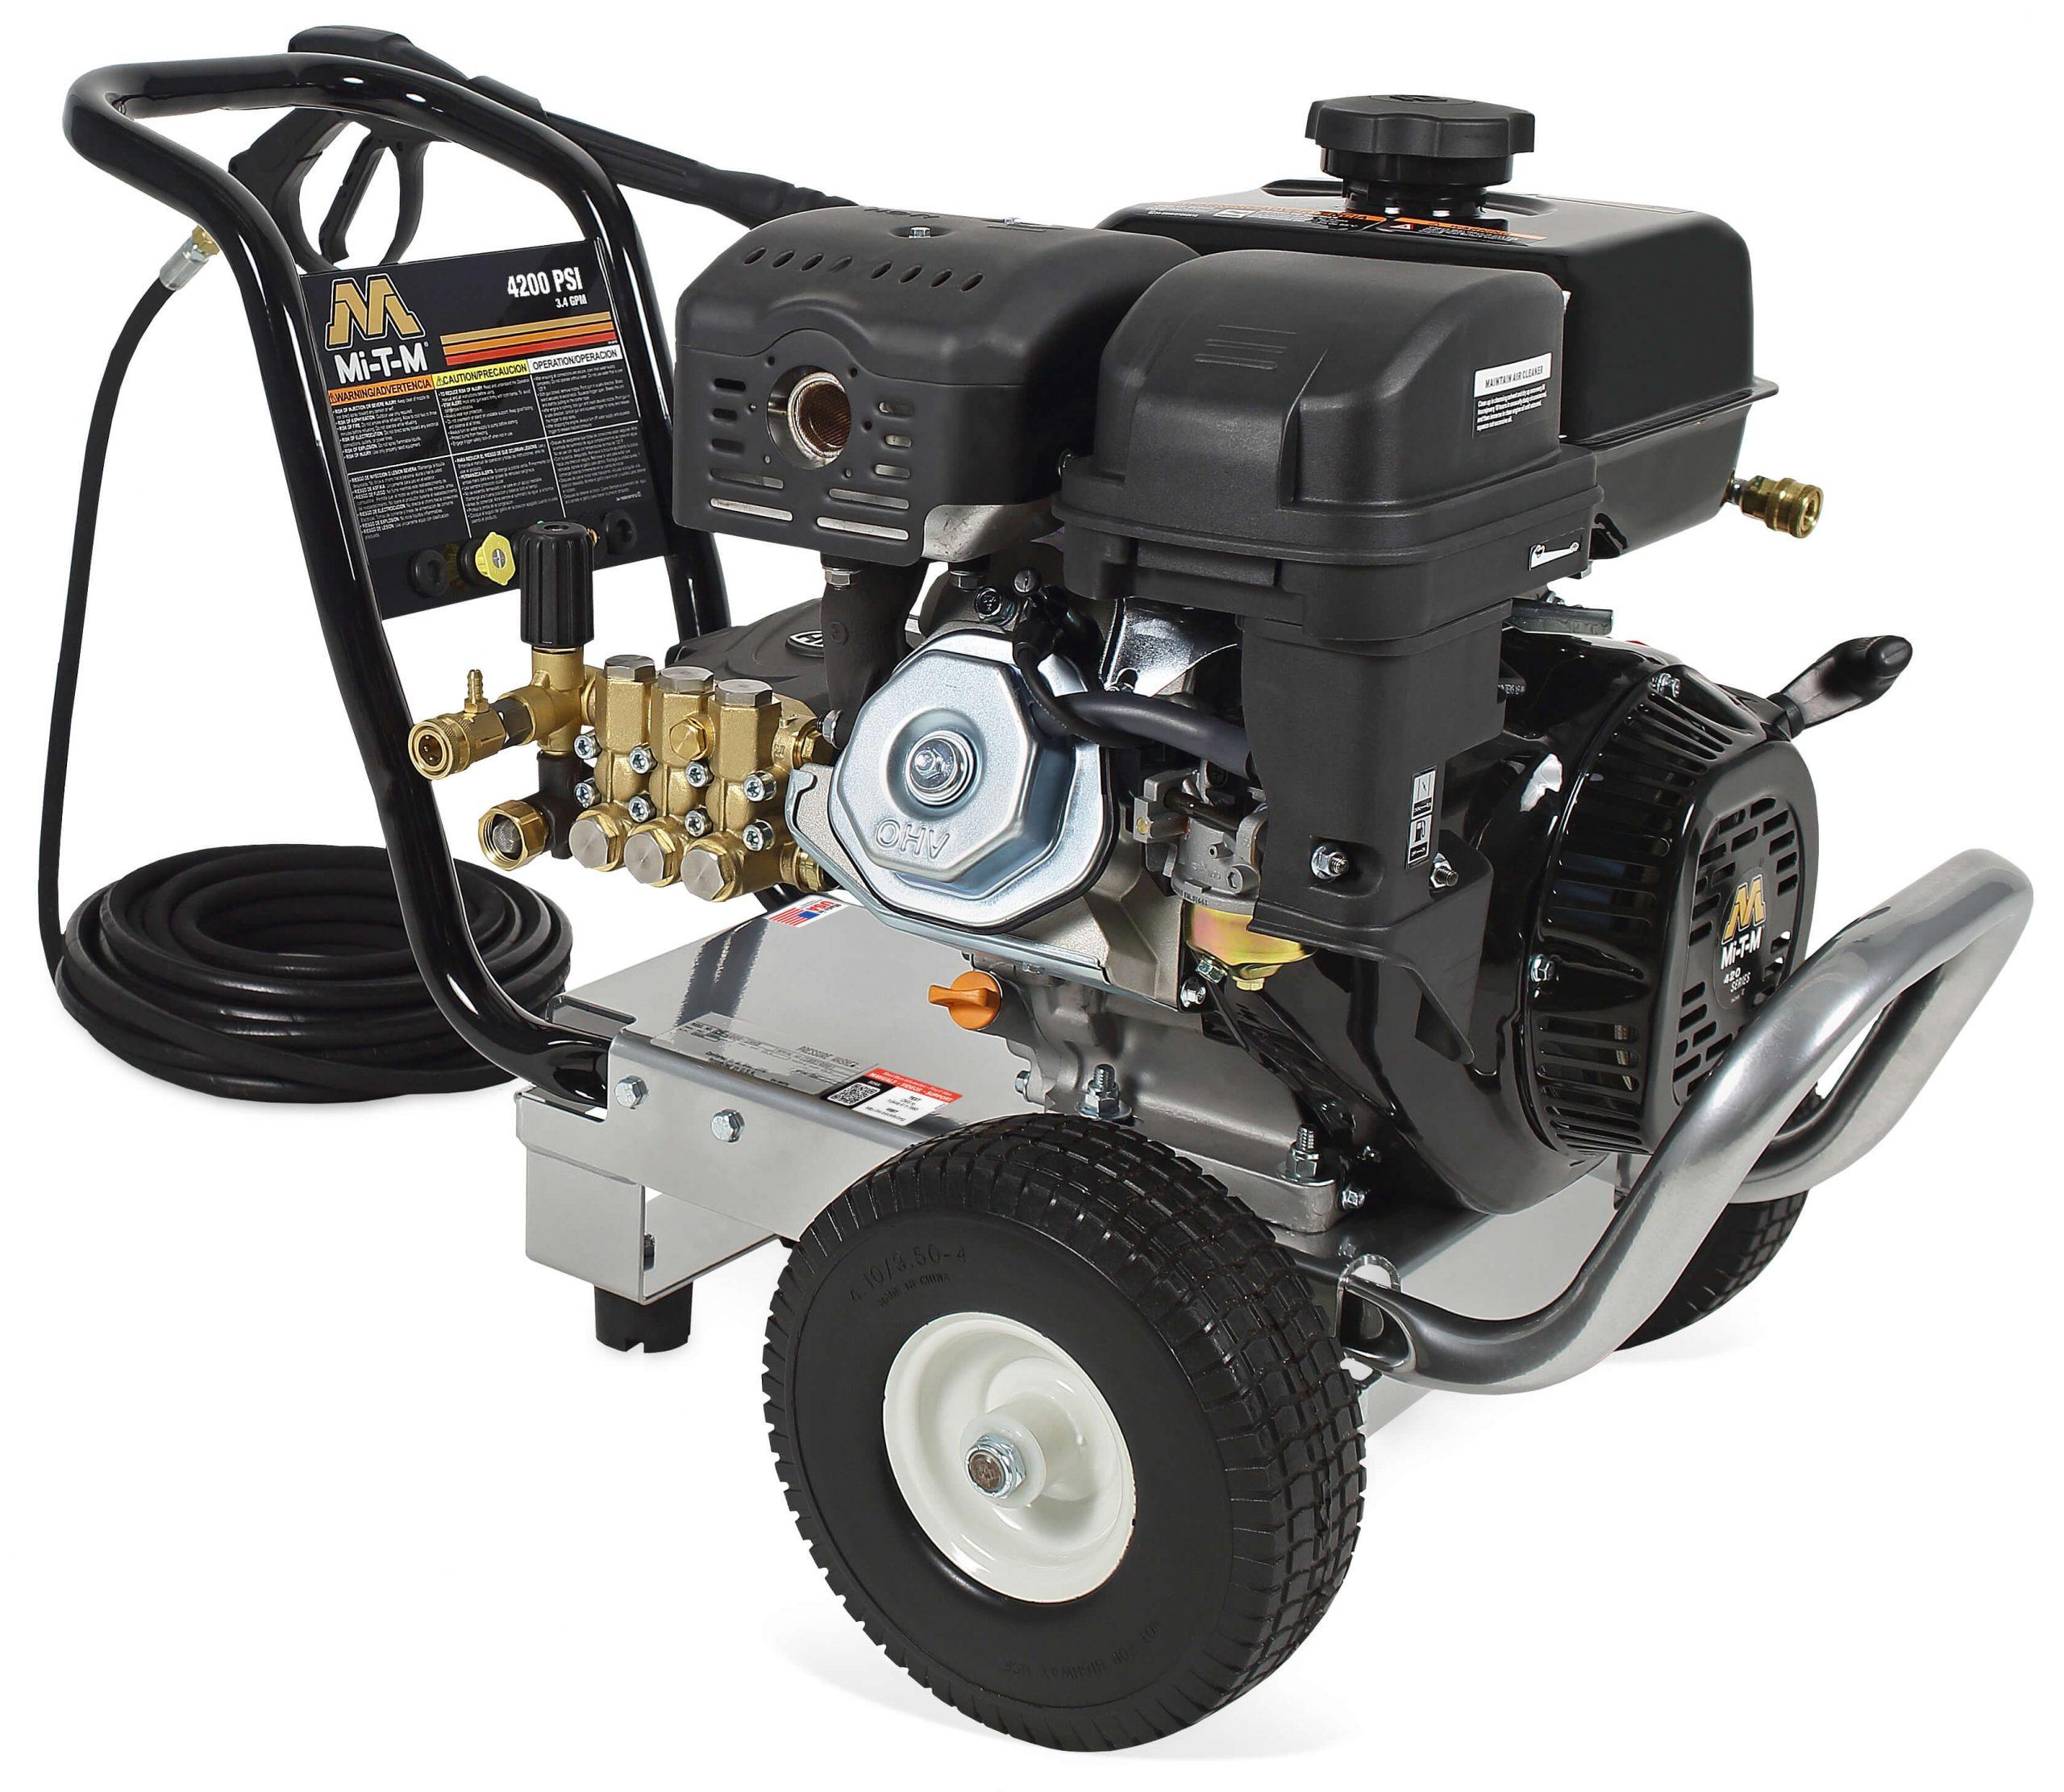 Laveuse à pression (4200PSI, Essence 3.4GPM) - CM-4200-0MMB Image